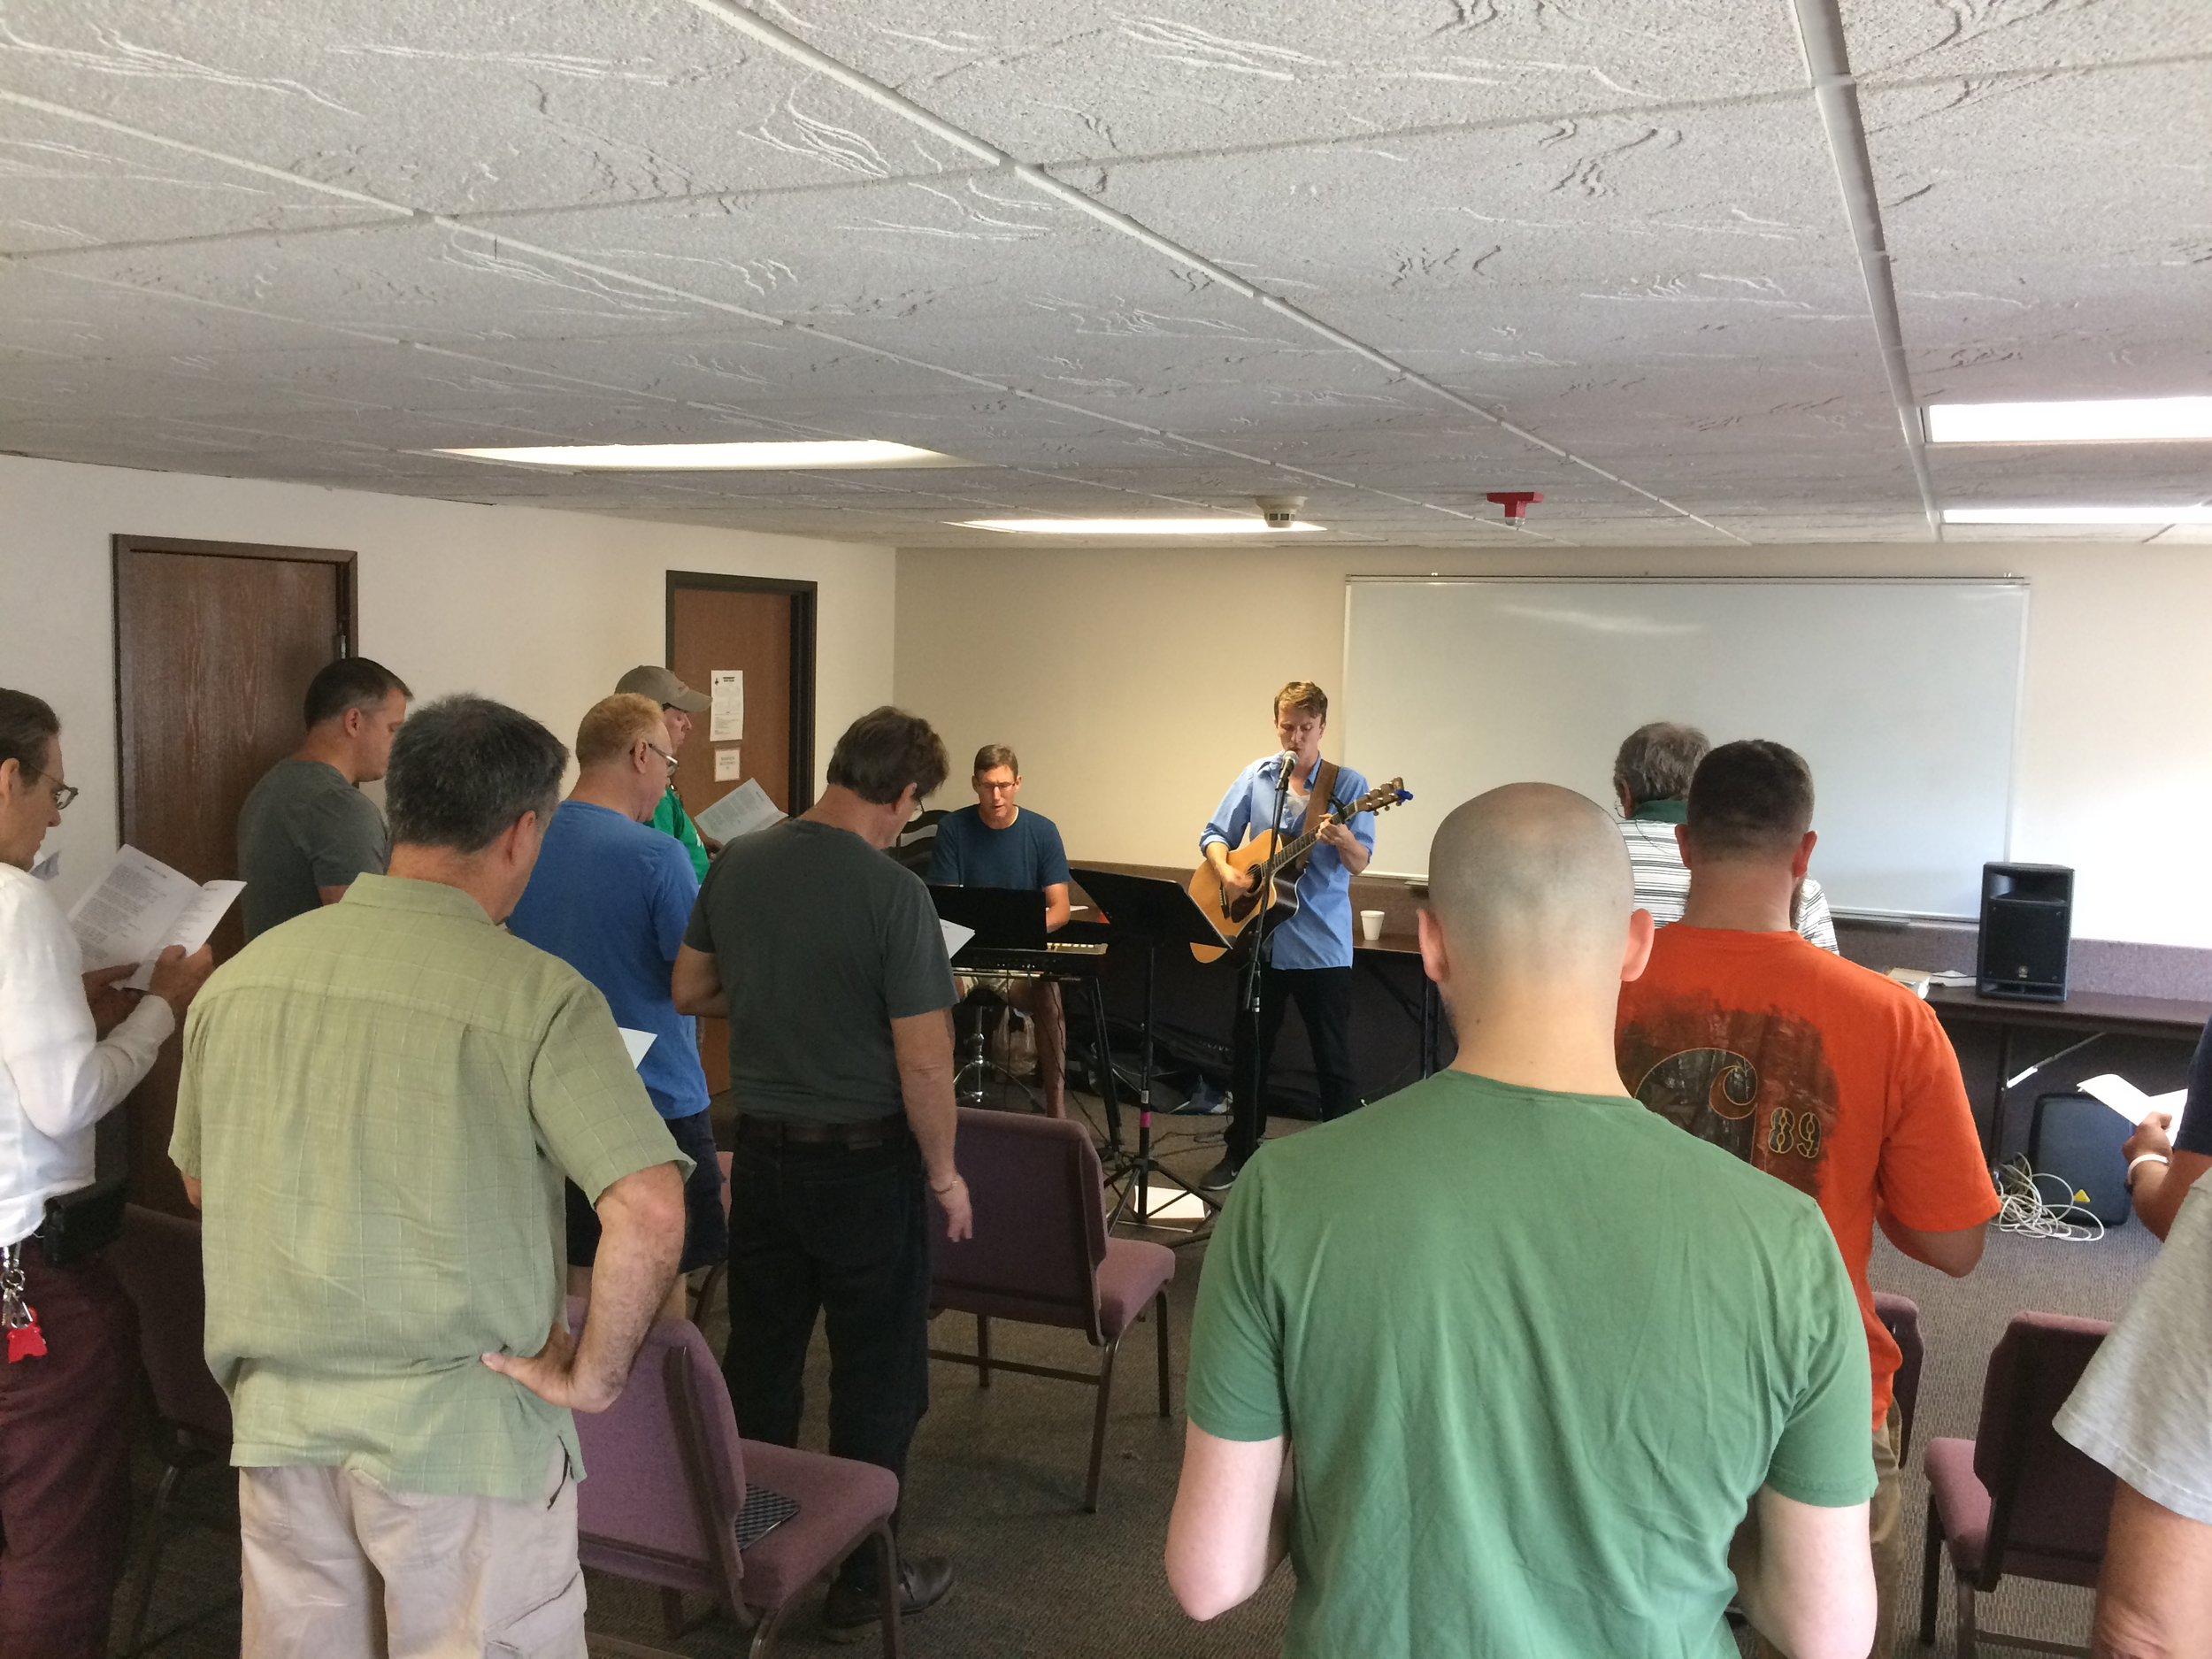 Worship session during 2017 retreat